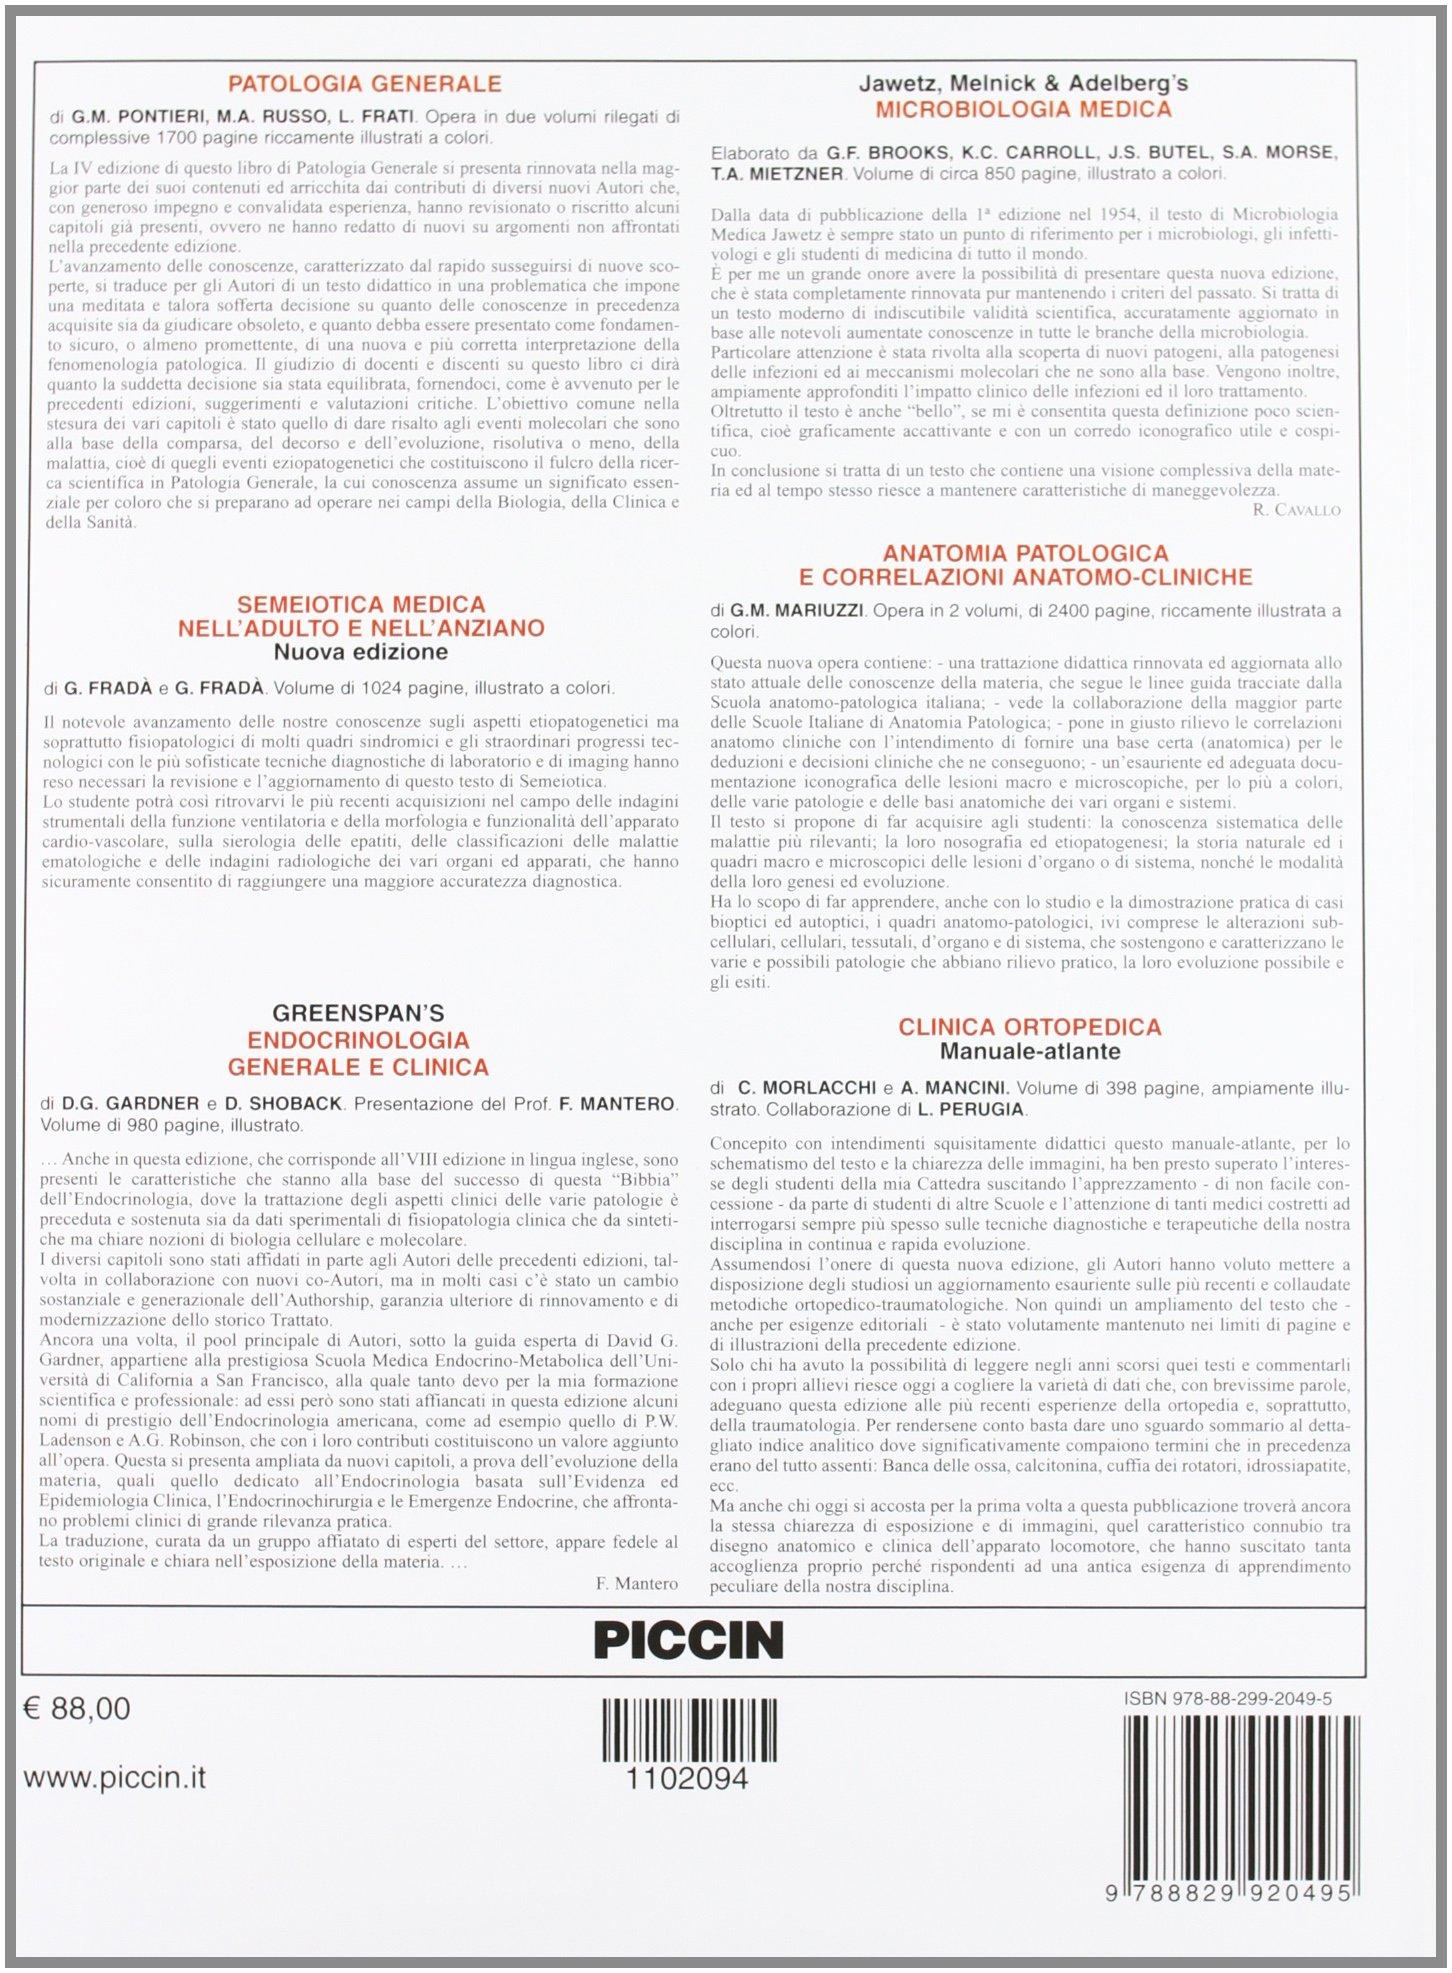 clnica ortopdica 2 volumes